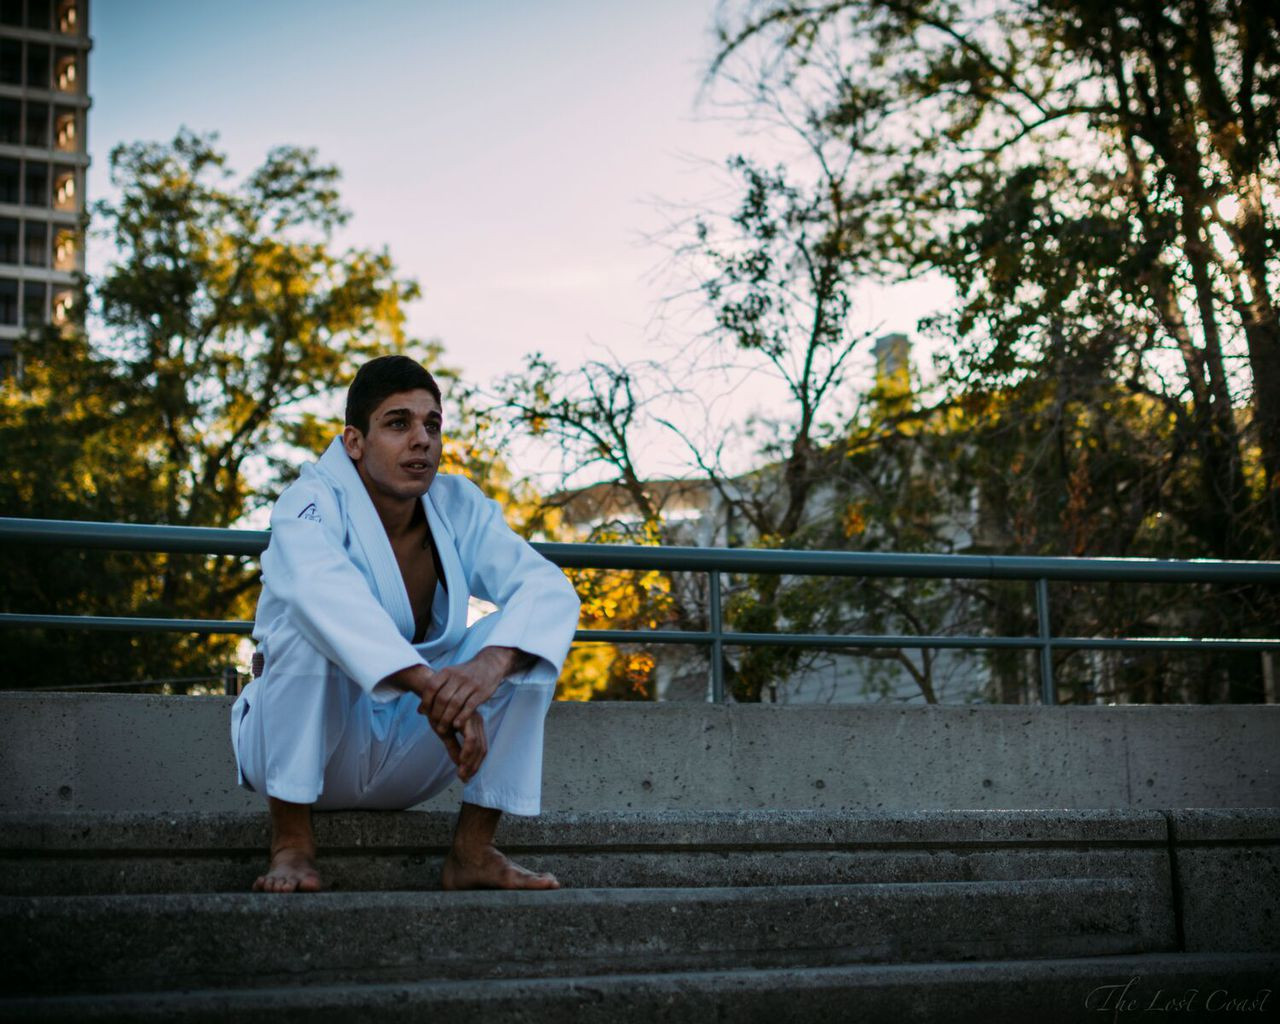 Sitting down thinking about how to choke the whole world out.  Pedro Silva in The Jiu Jitsu Shop Minimalist Kimono